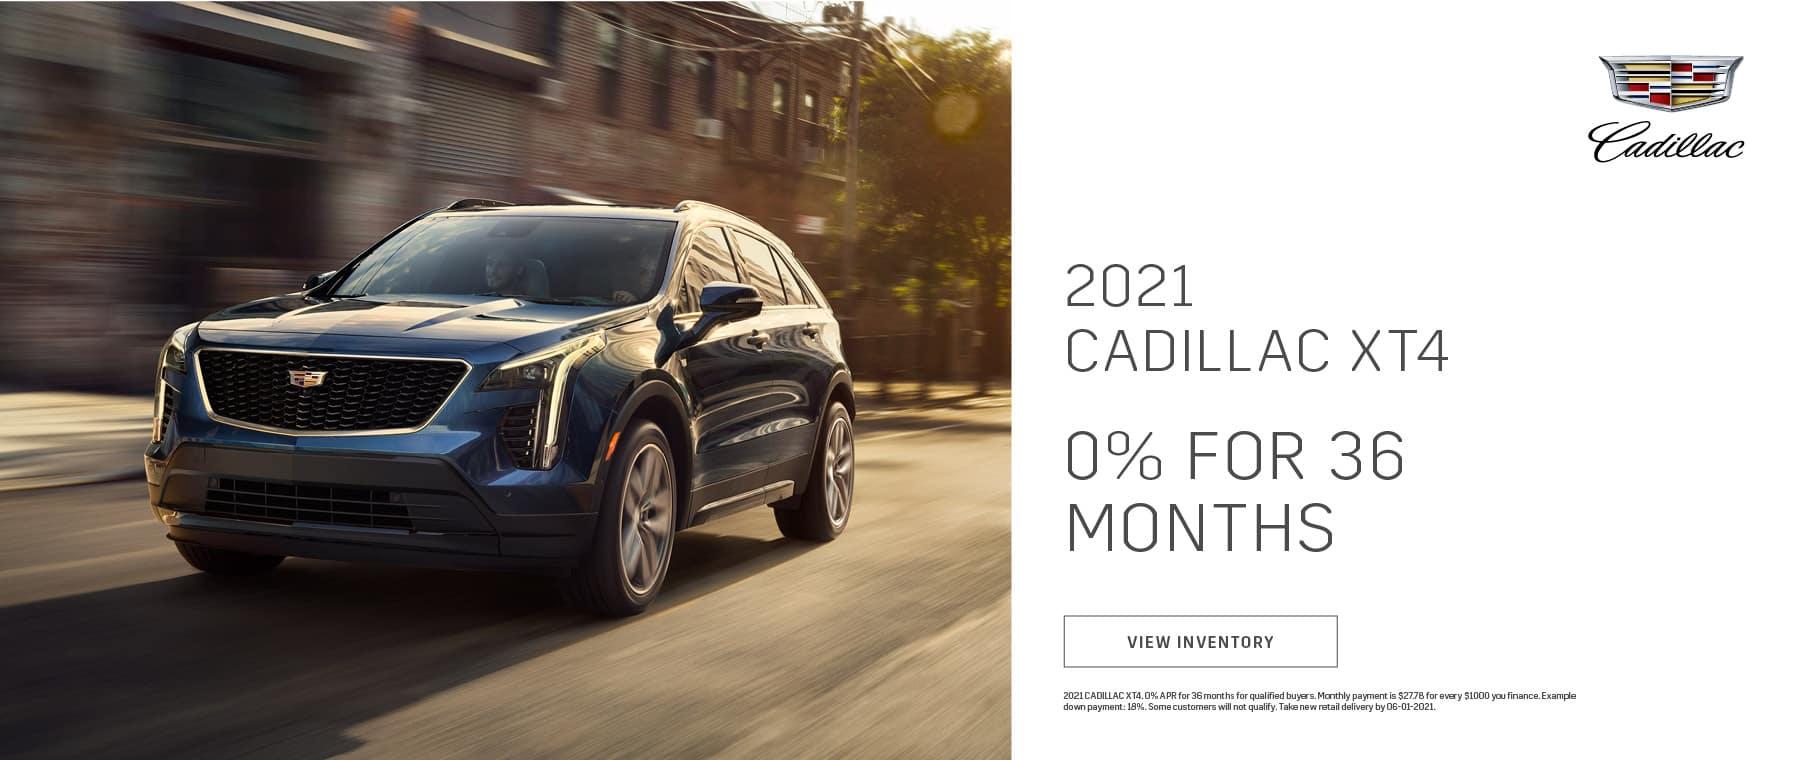 2021 Cadillac XT4 - Bert Ogden Cadillac in Mission, Texas